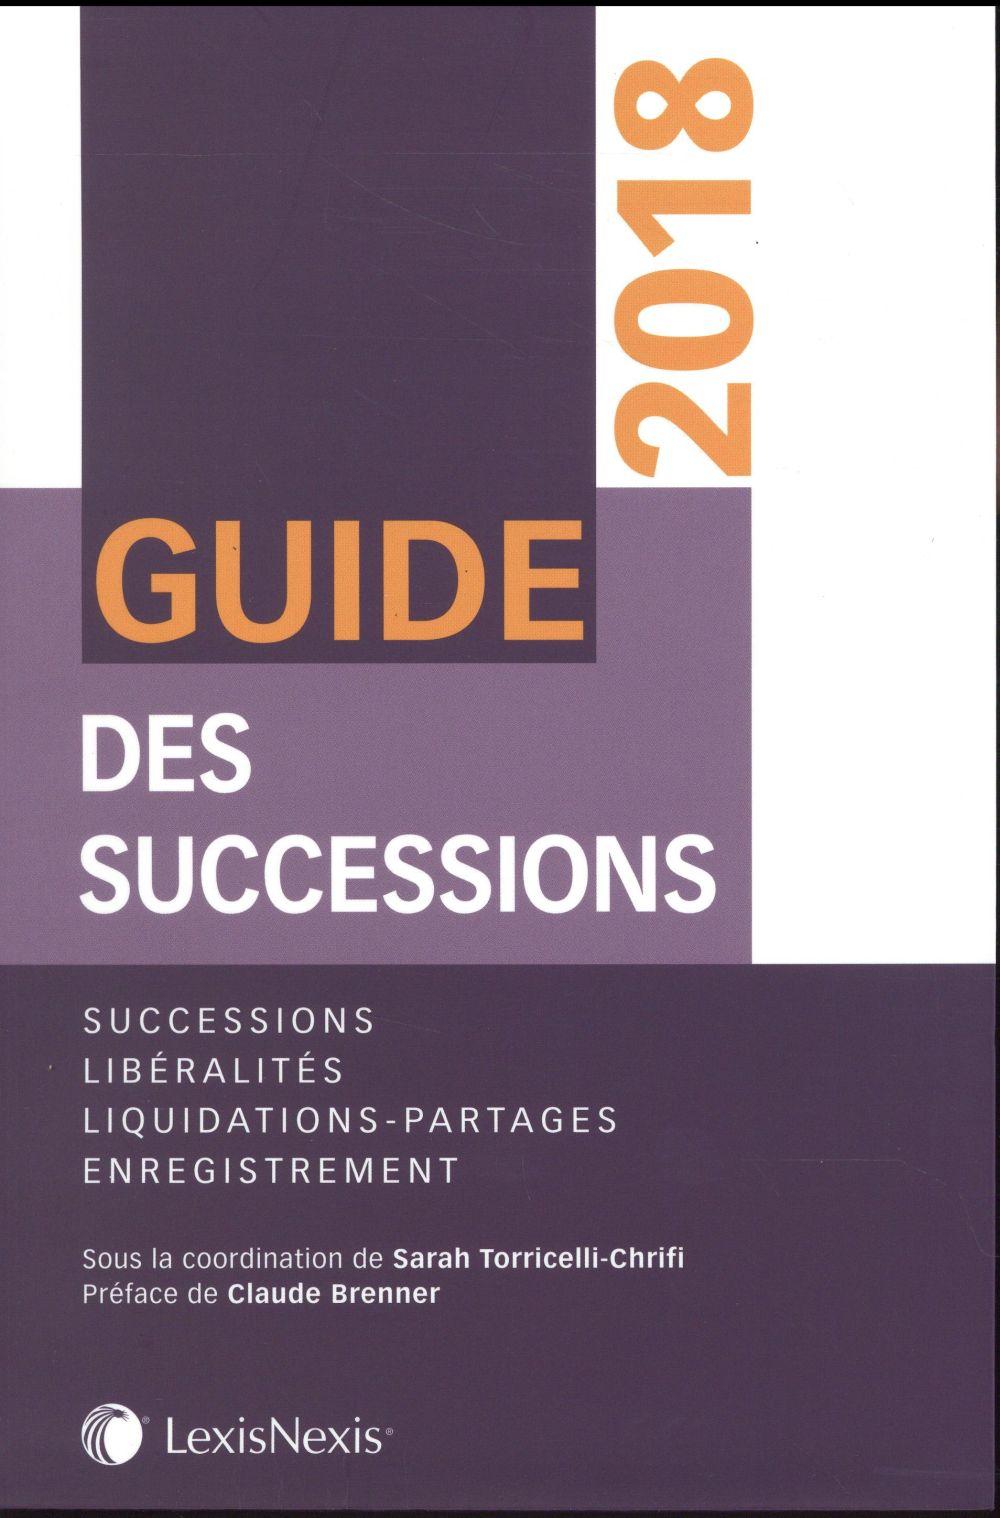 GUIDES DES SUCCESSIONS 2018 - SUCCESSIONS  LIBERALITES  LIQUIDATIONS PARTAGES  ENREGISTREMENT  PREFA